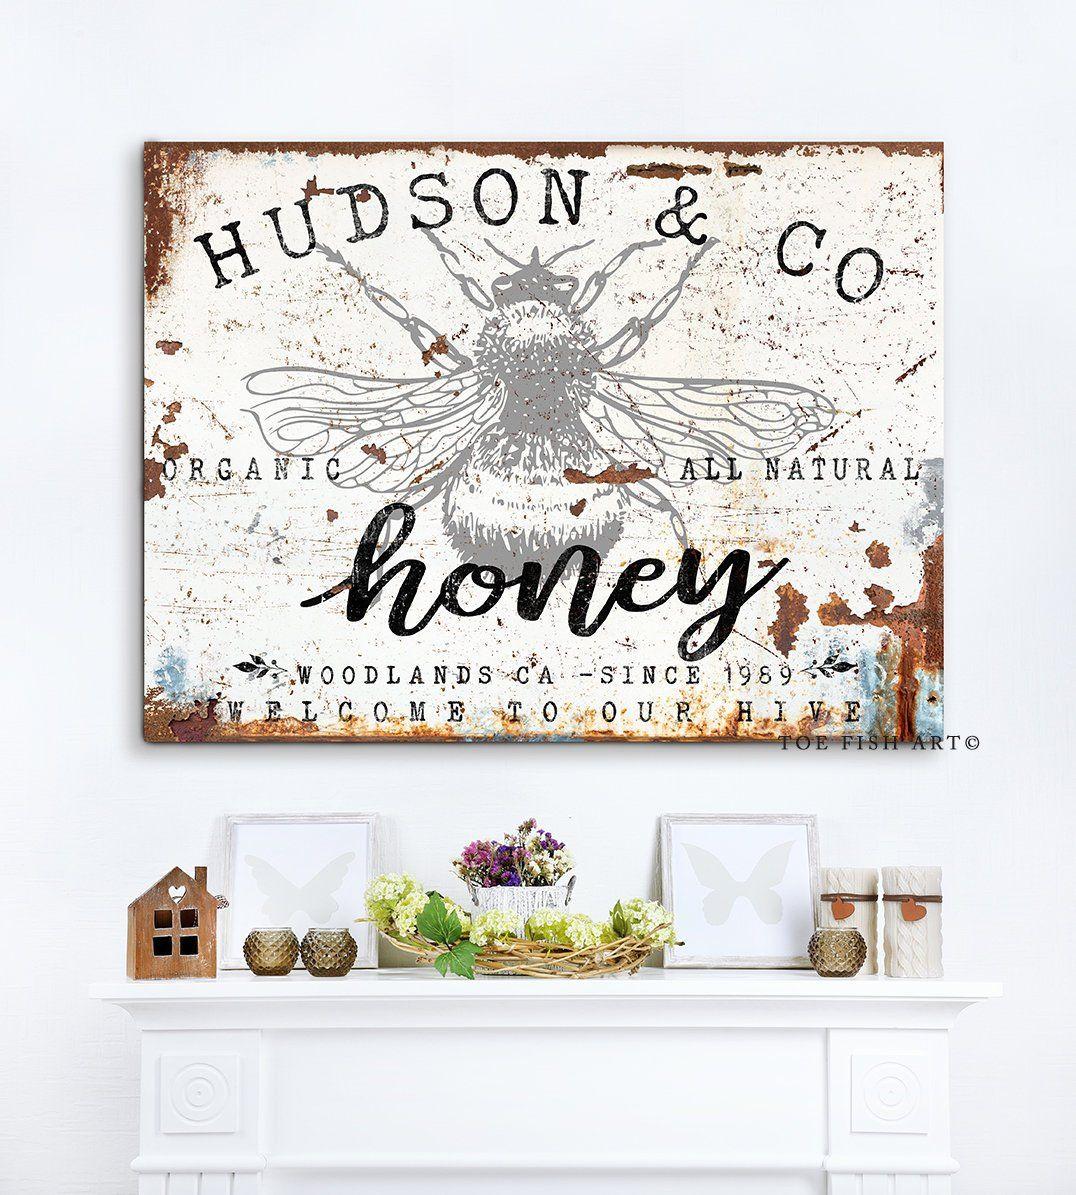 Vintage Farmhouse Decor Custom Family Name Sign Personalized Last Name Wall Art Rustic Honey Bee Decor Fa Honey Bee Decor Name Wall Art Vintage Farmhouse Decor